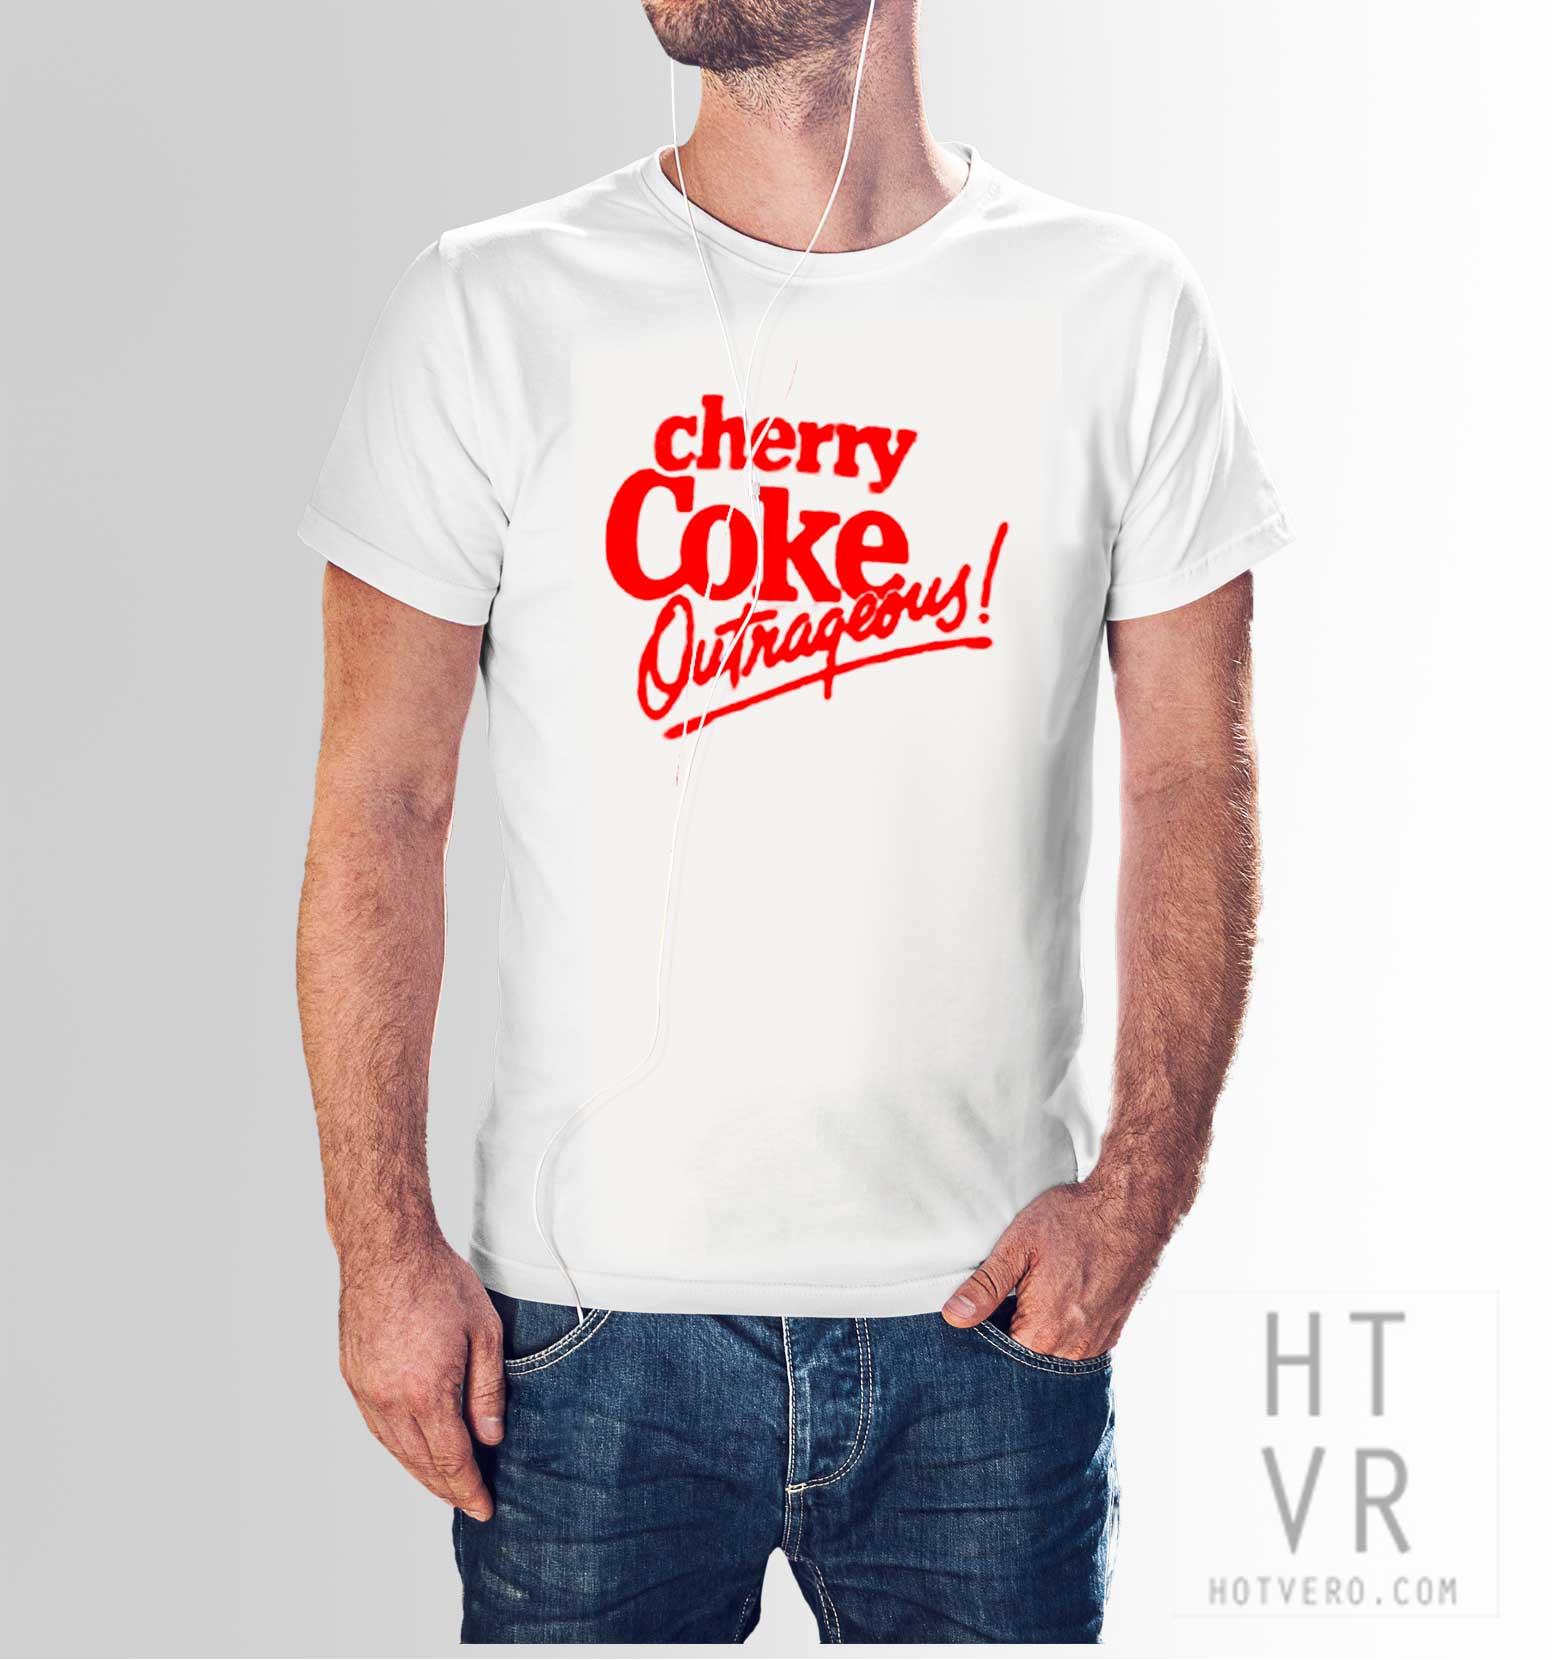 Cherry Coke Outrageous Vintage 80s T Shirt Hotvero